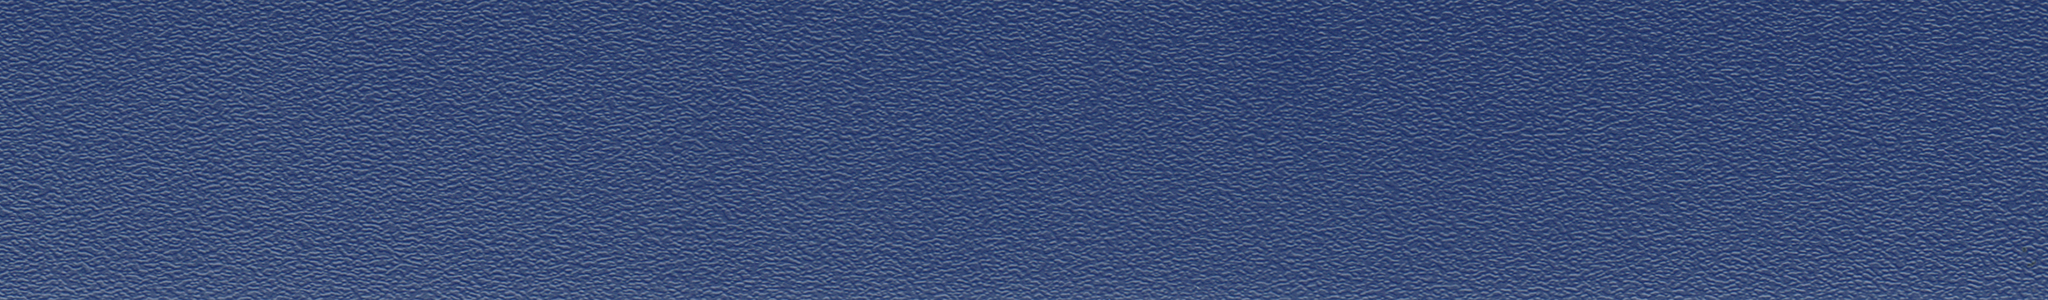 HU 150570 ABS hrana půlnoční modrá perla XG